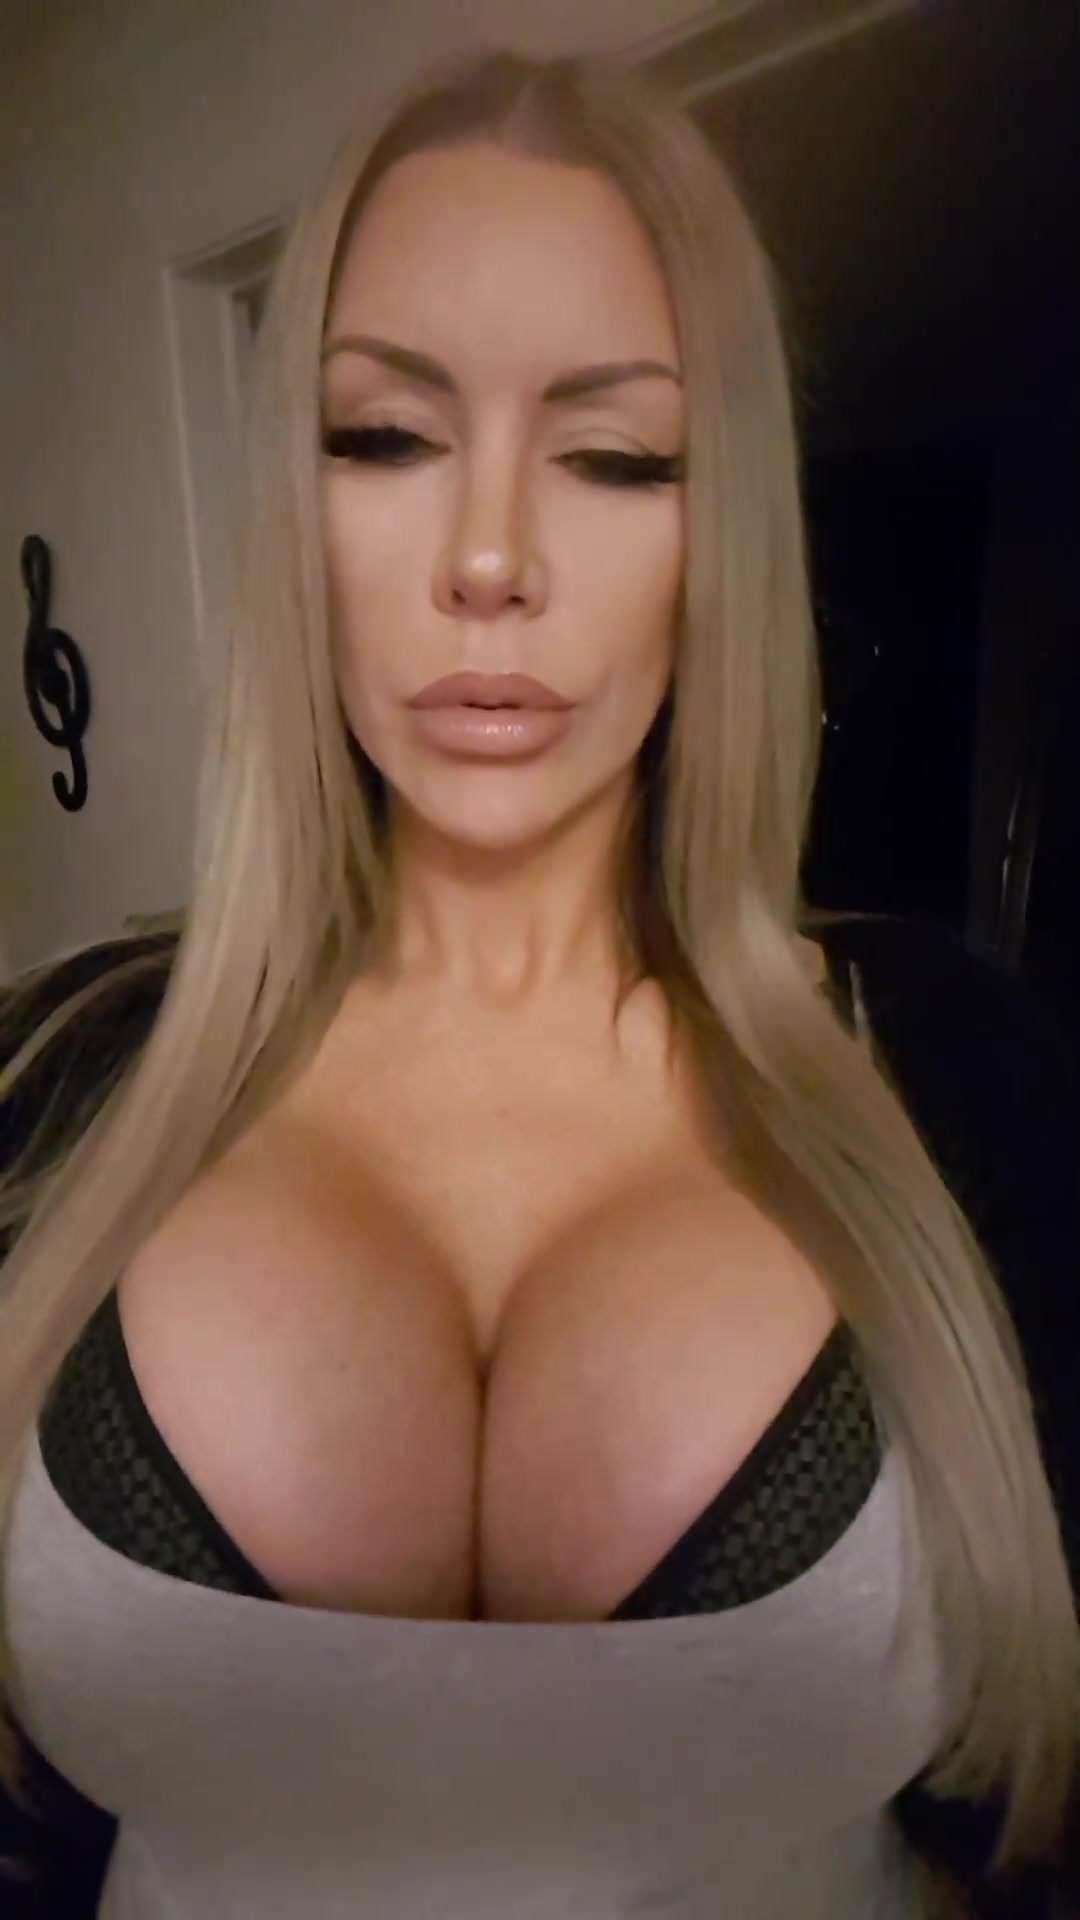 Hot Milf With Big Fake Tits 4, Free Youtube Hd Porn Ad-6290